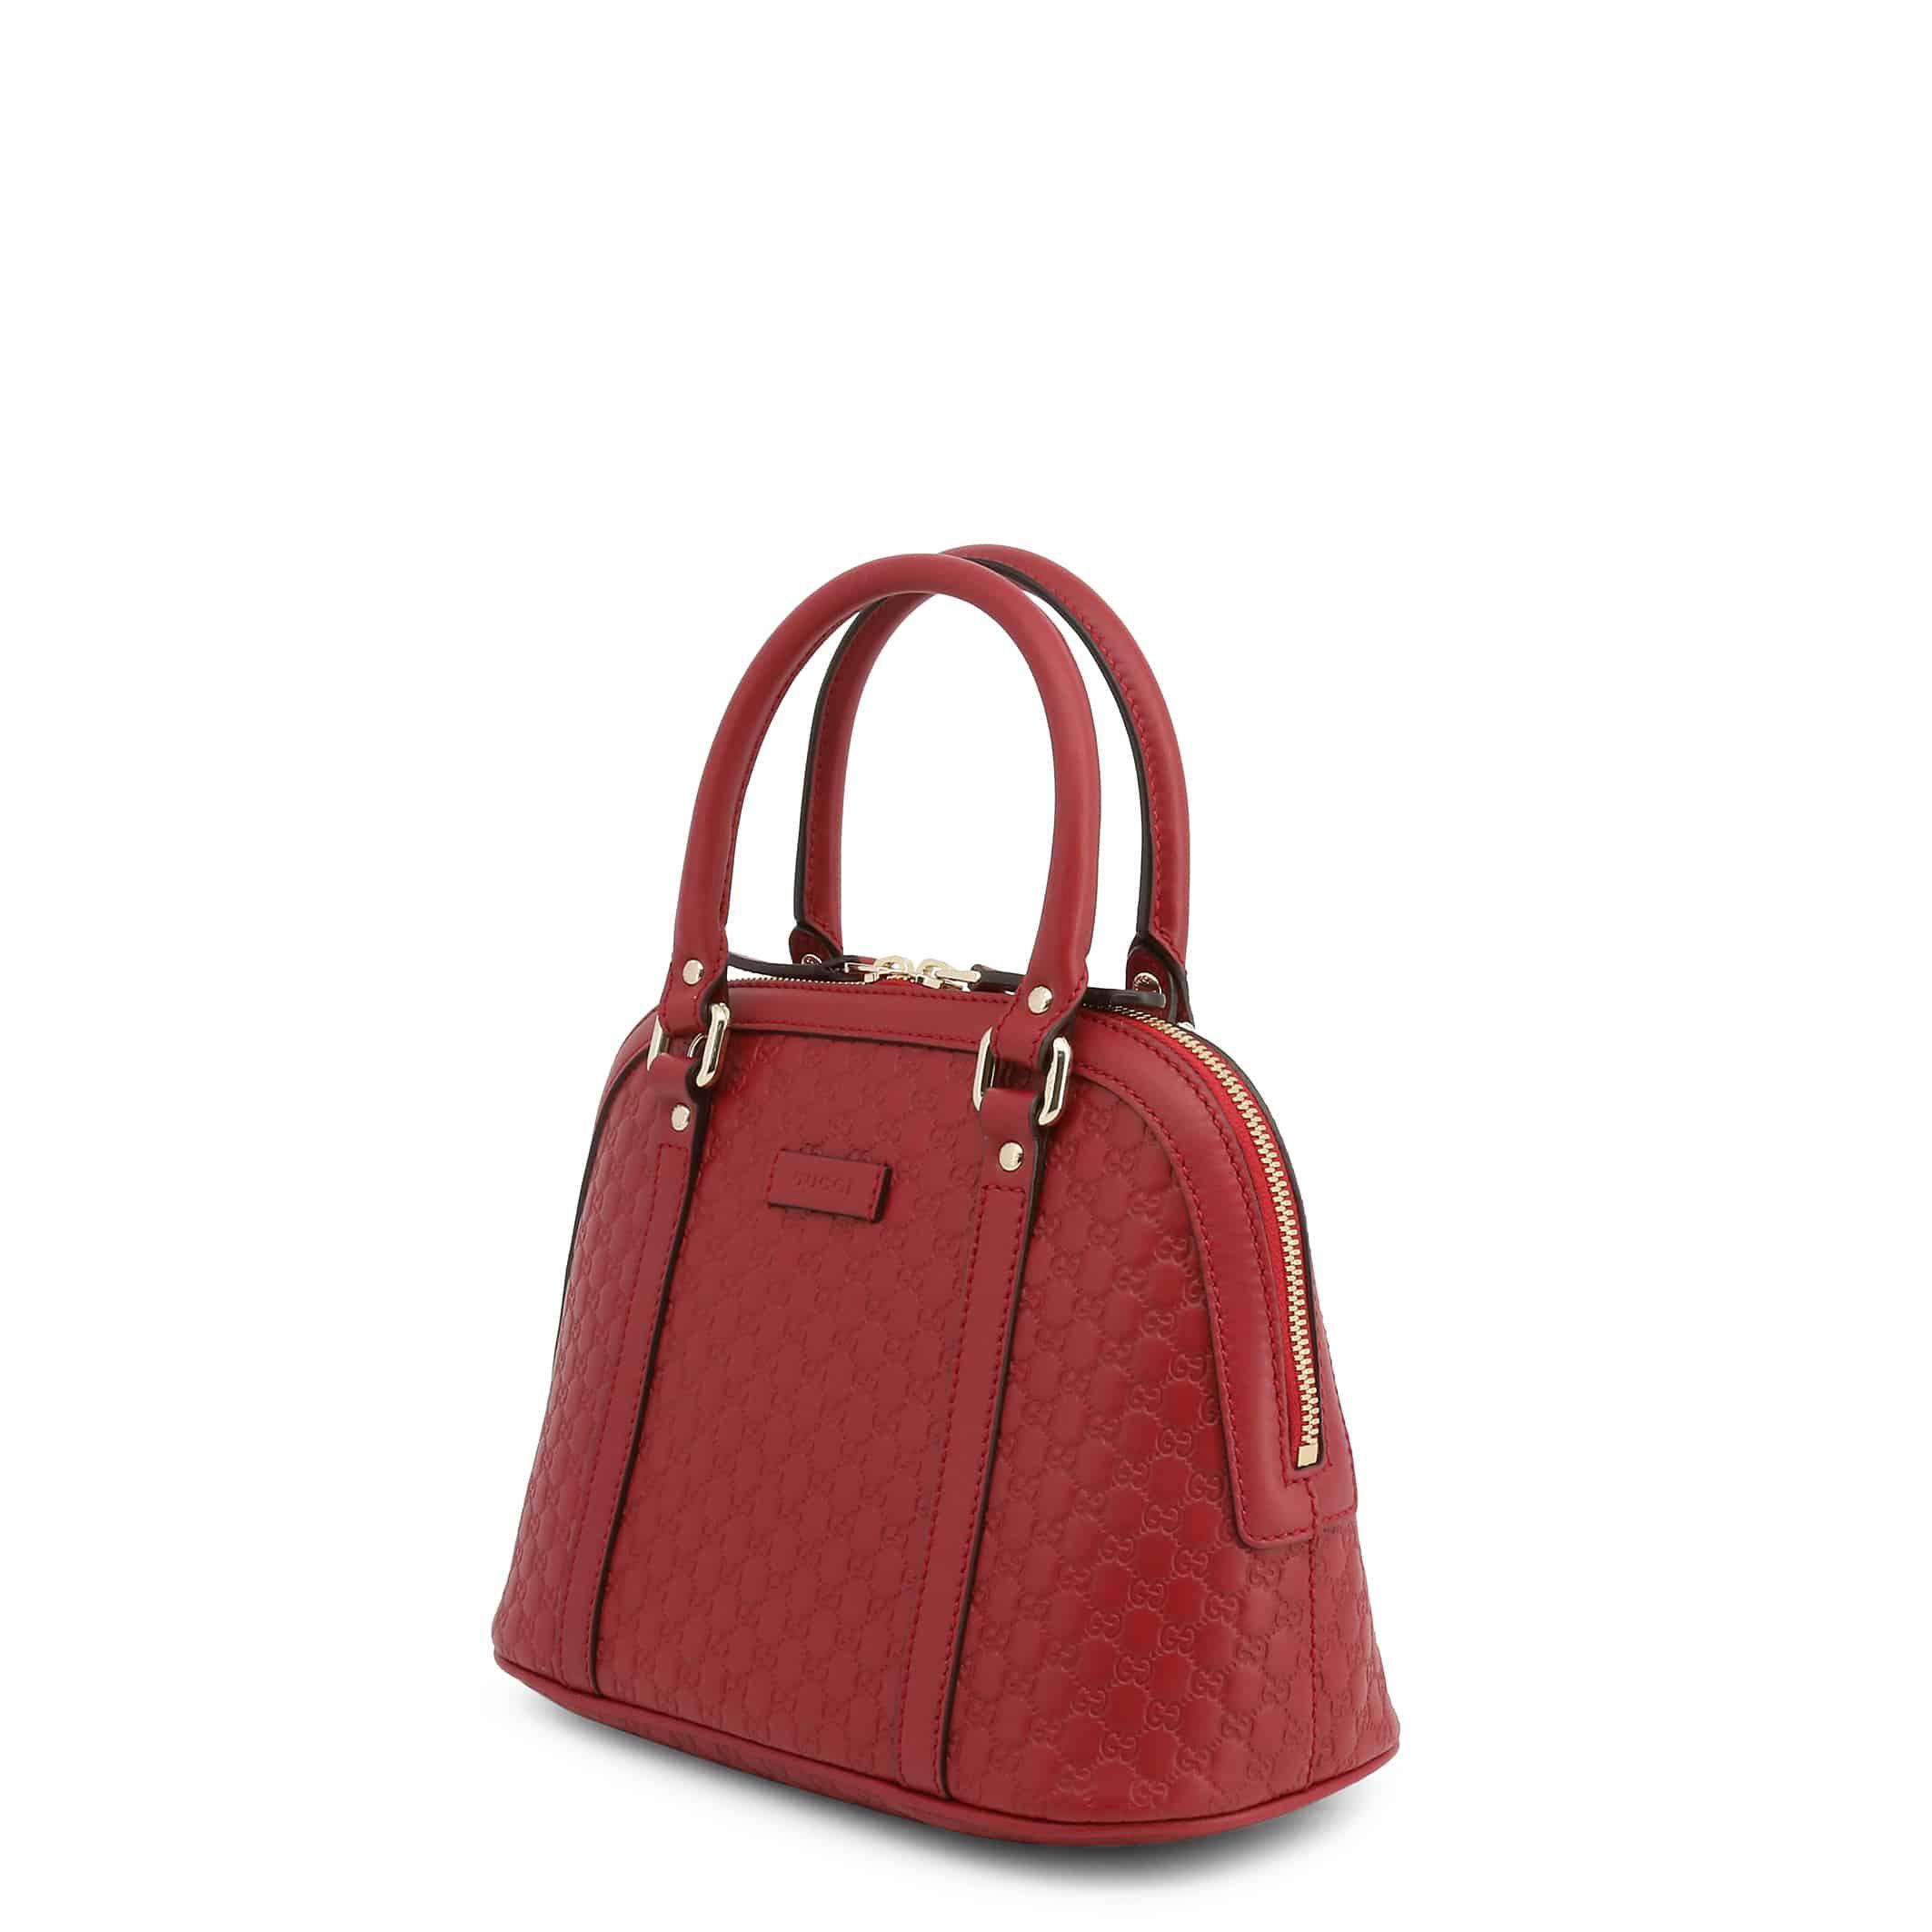 Gucci – 449654_BMJ1G – Rojo